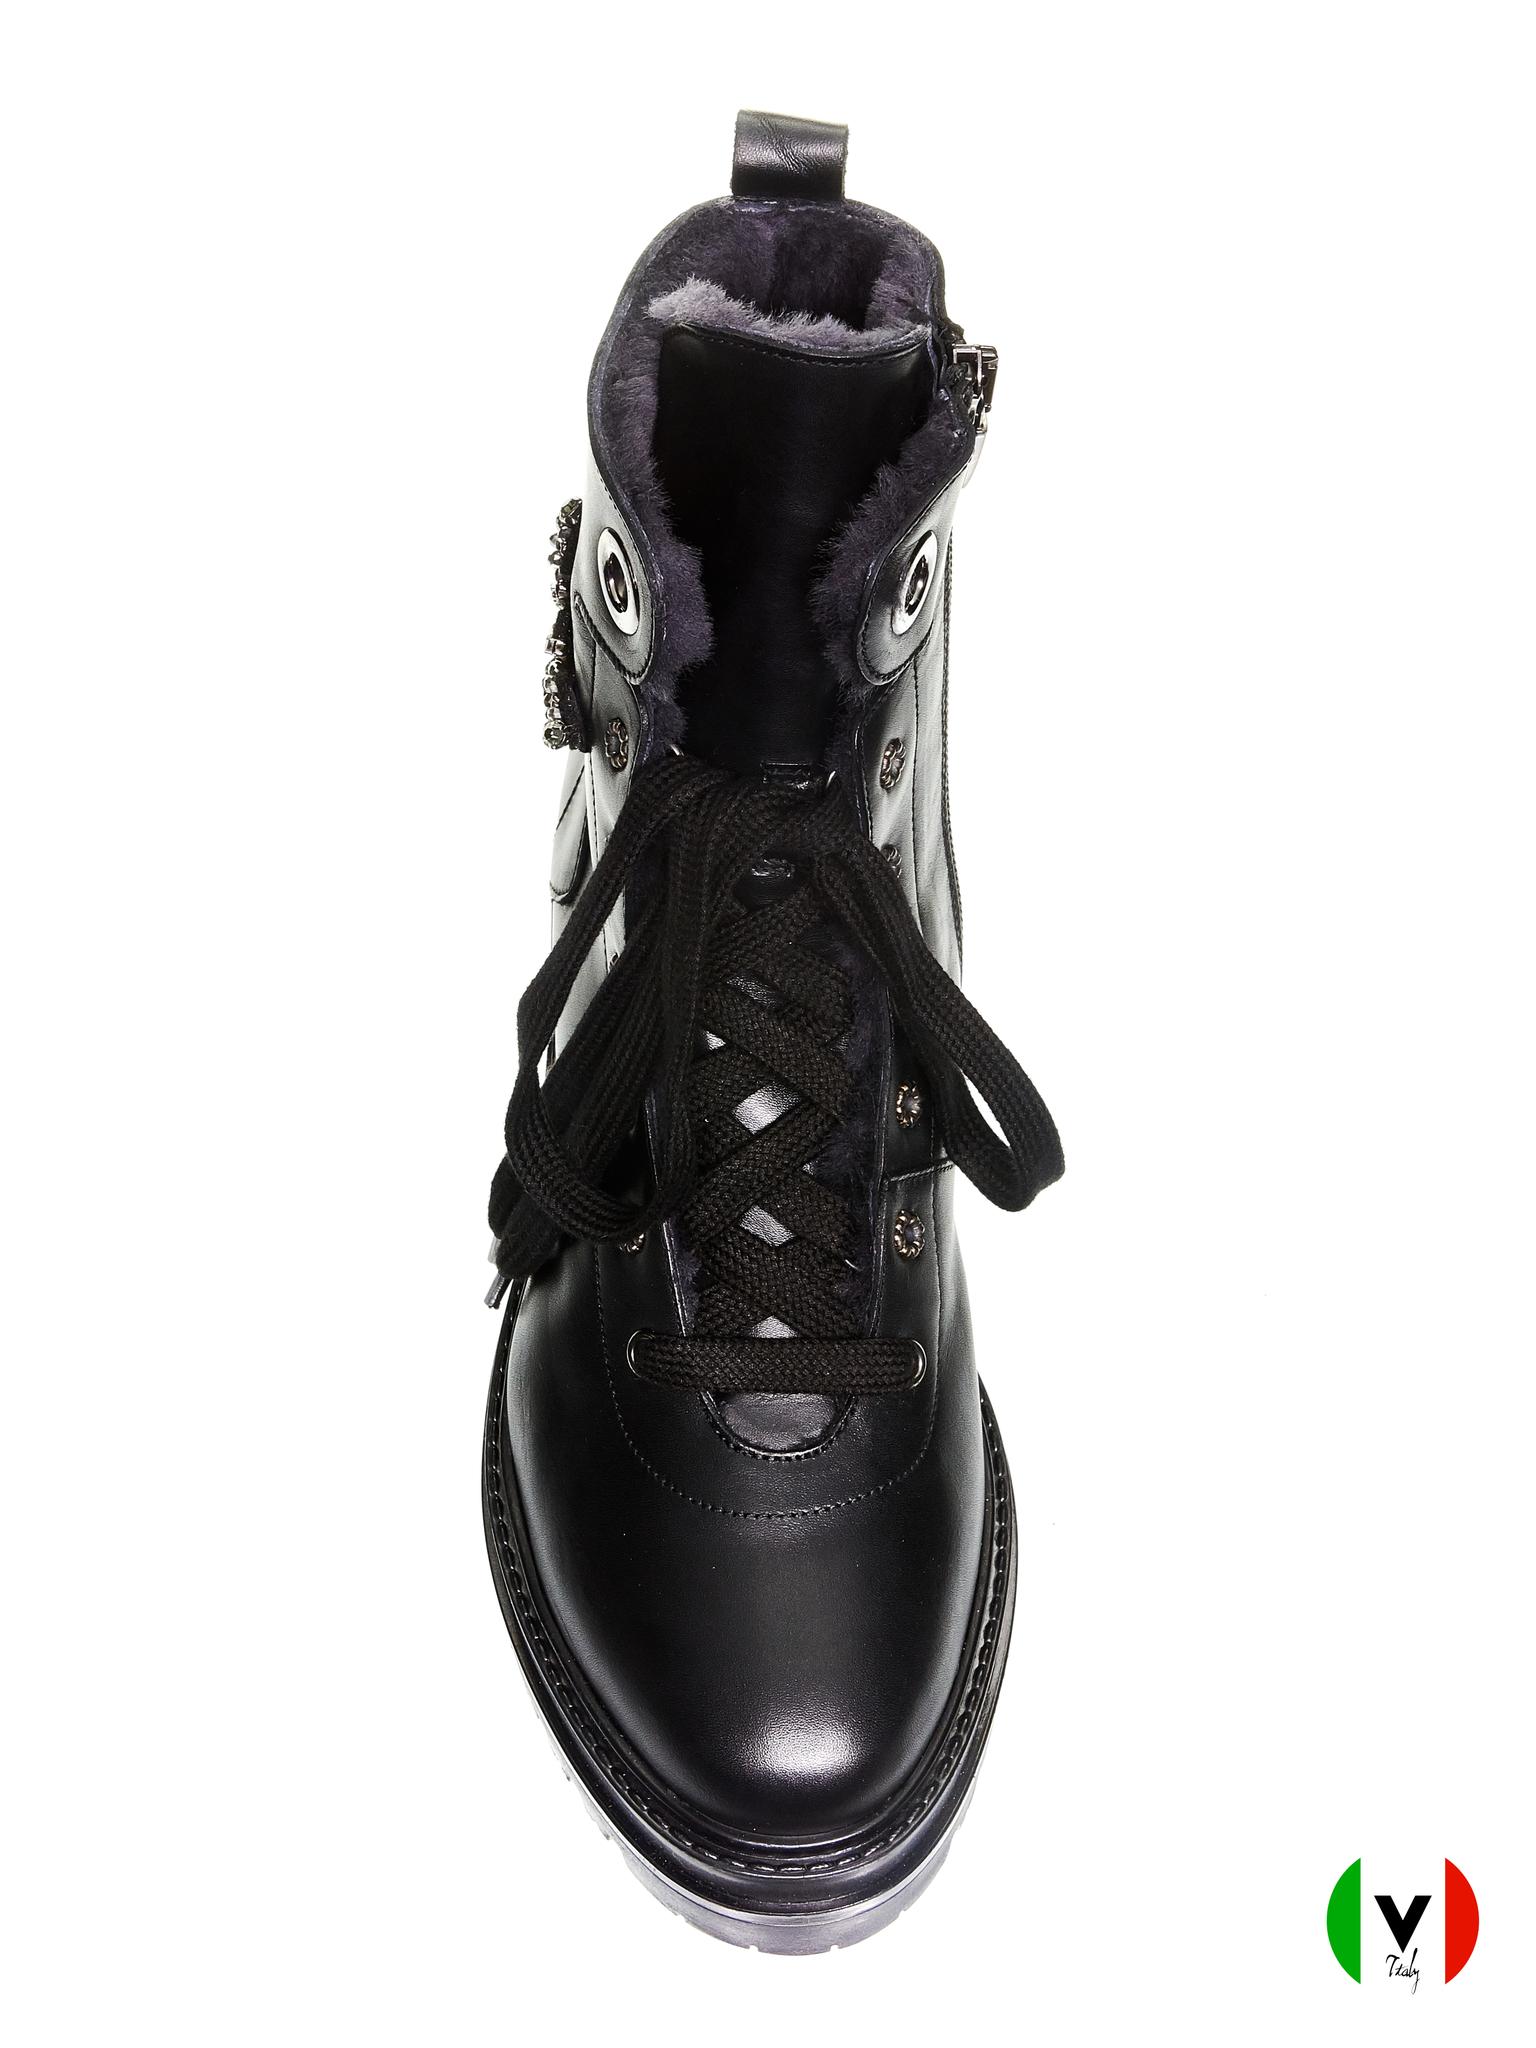 Ботинки Laura Bellariva, артикул 2060, сезон зима, цвет чёрный, материал кожа, цена 18 500 руб., veroitaly.ru